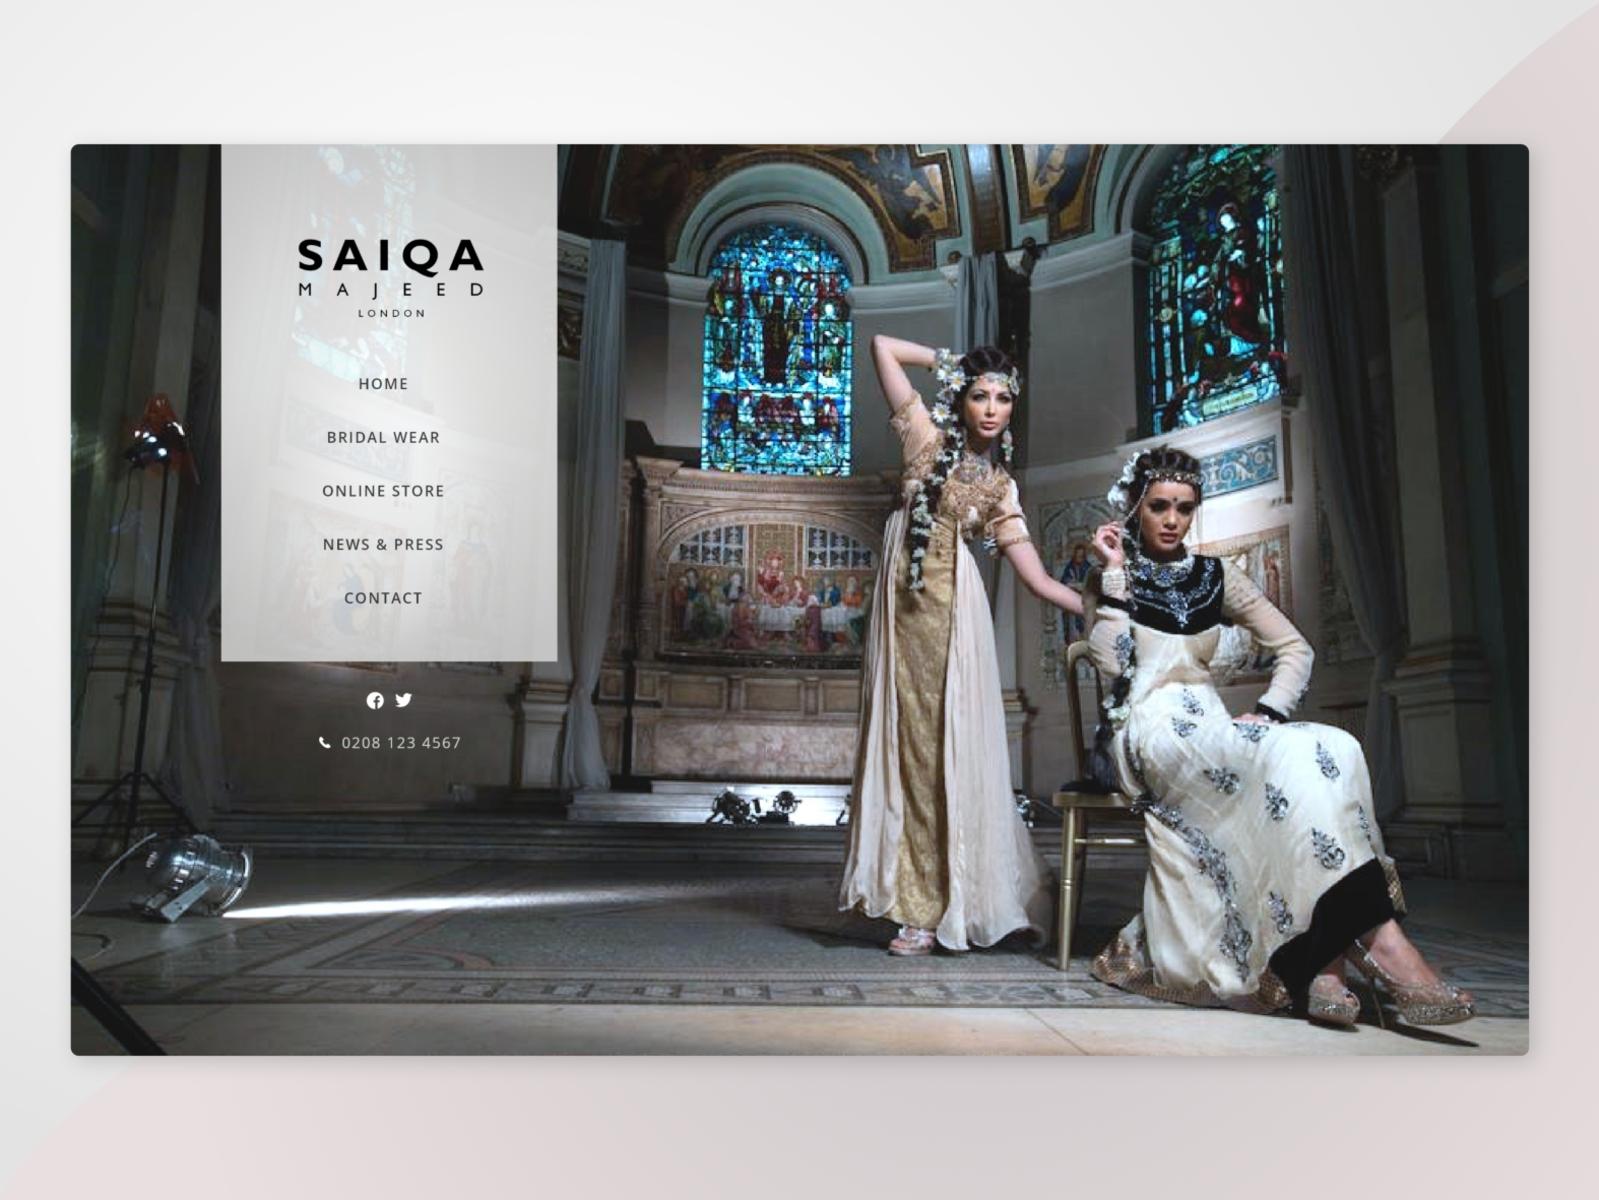 Luxury Designer Fashion May 13 Web Design Gphx Designs By Zahra Siddiquia On Dribbble